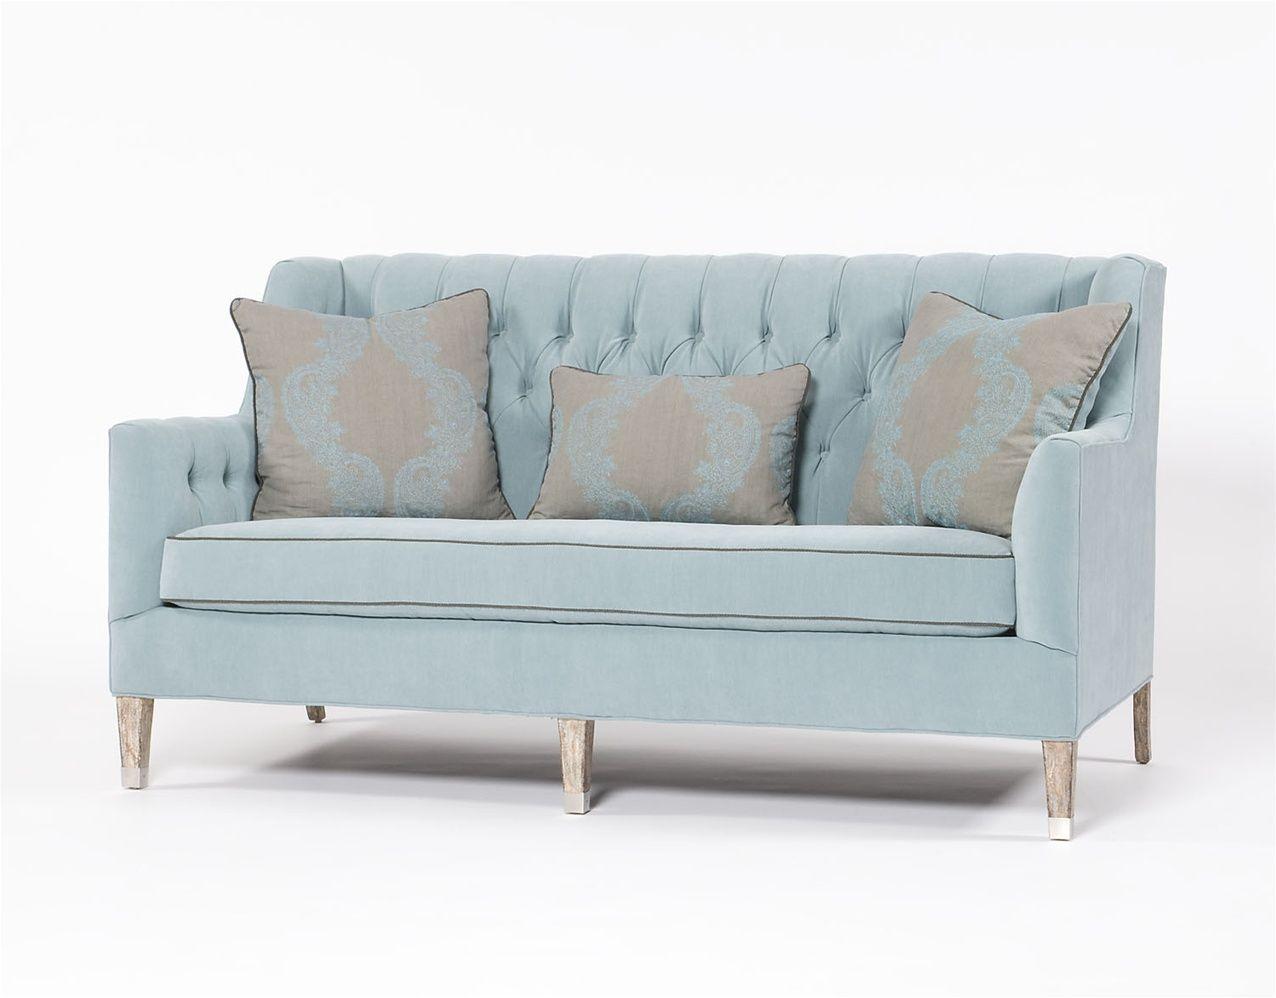 Best Blue Tufted Sofa Traditional Sofa Blue Tufted Sofa 400 x 300